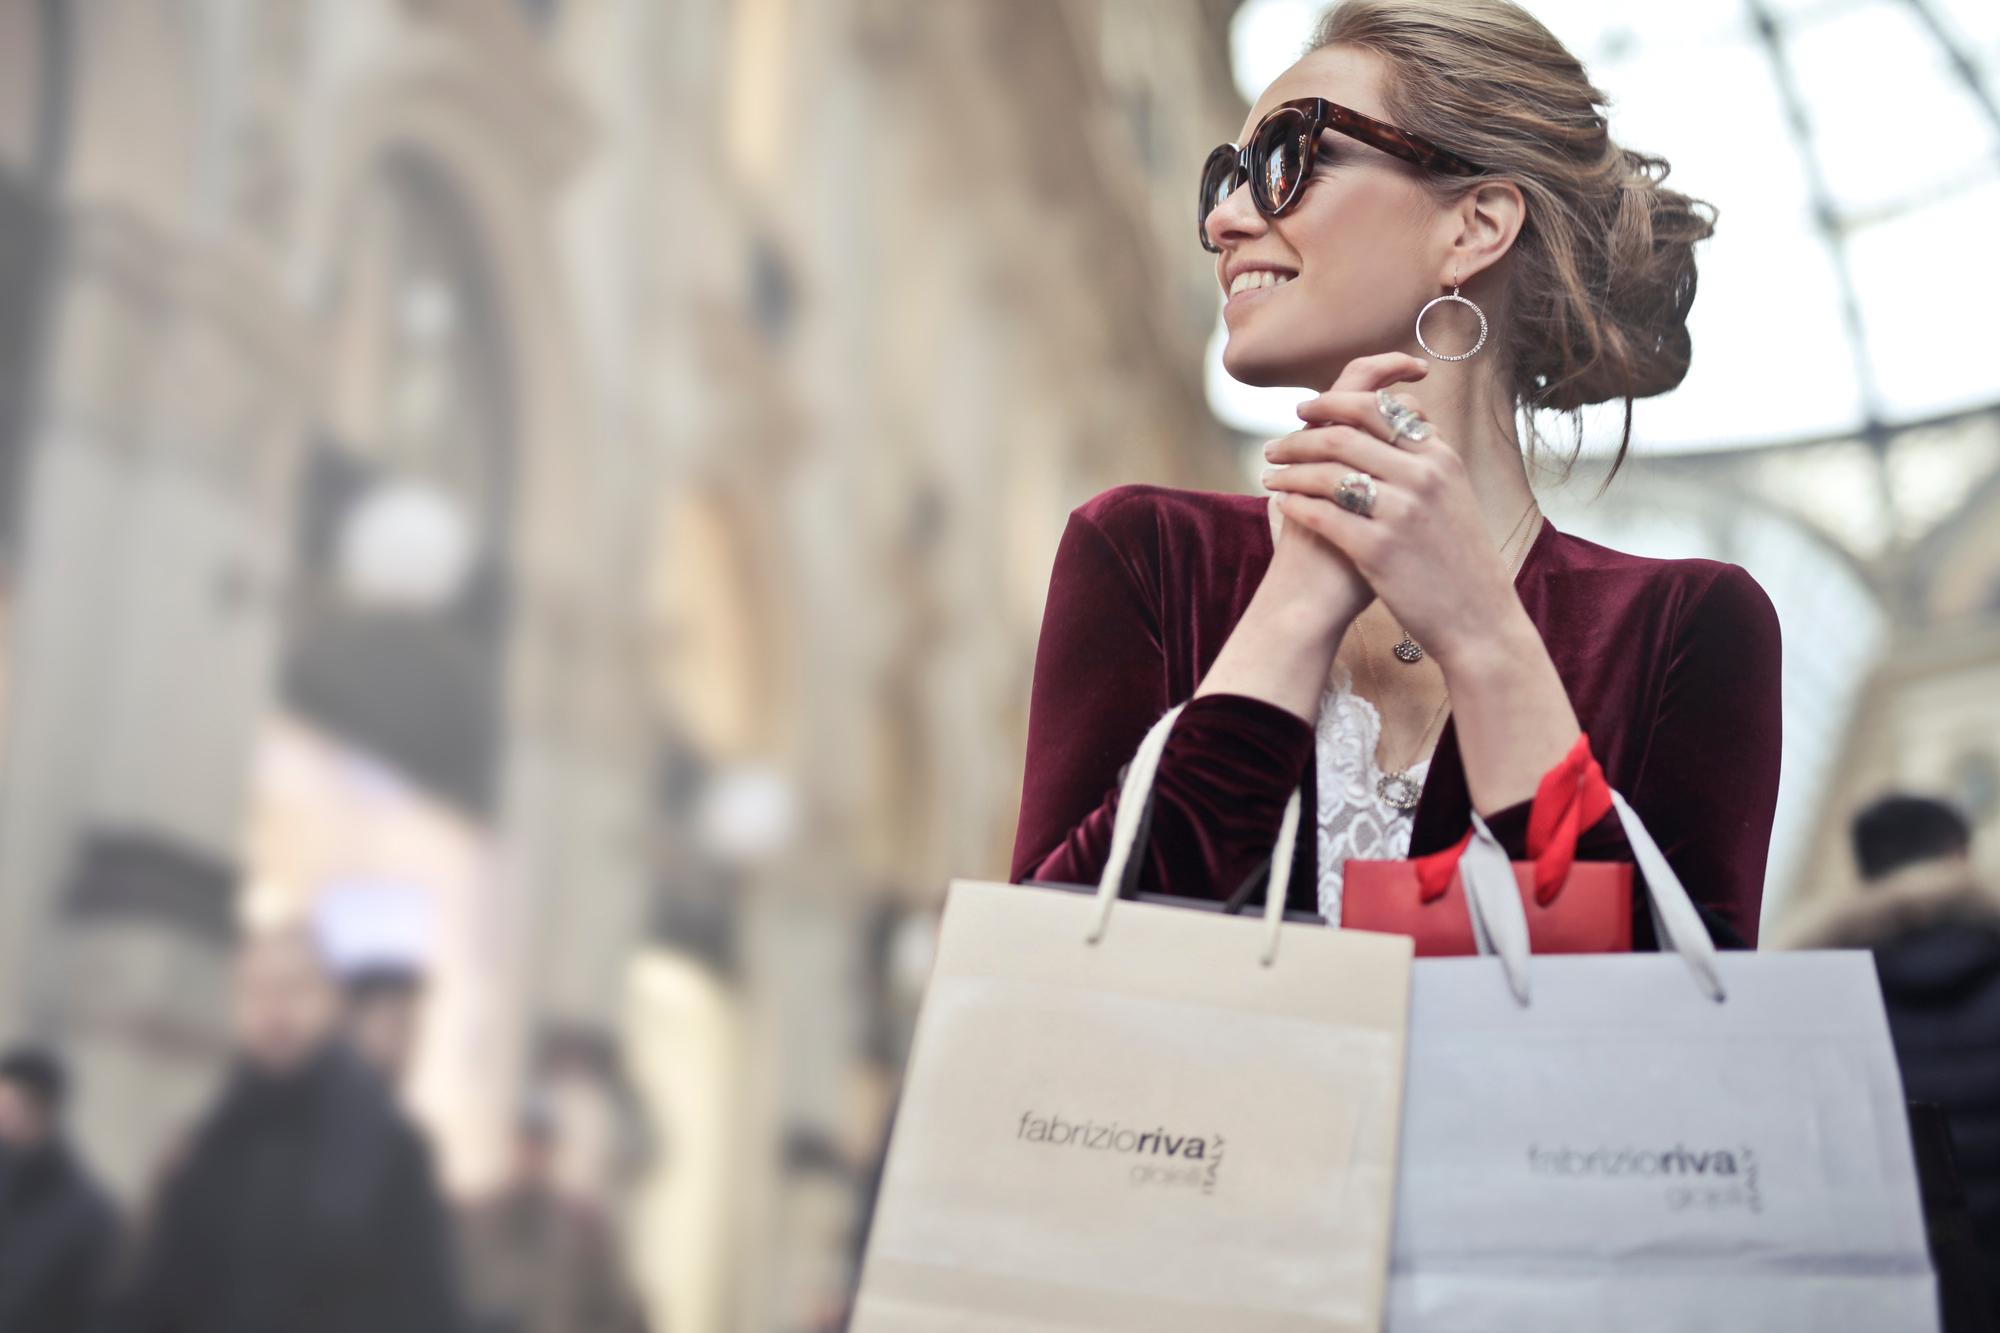 Girl's Guide to the Fanciest Shops in Seminyak